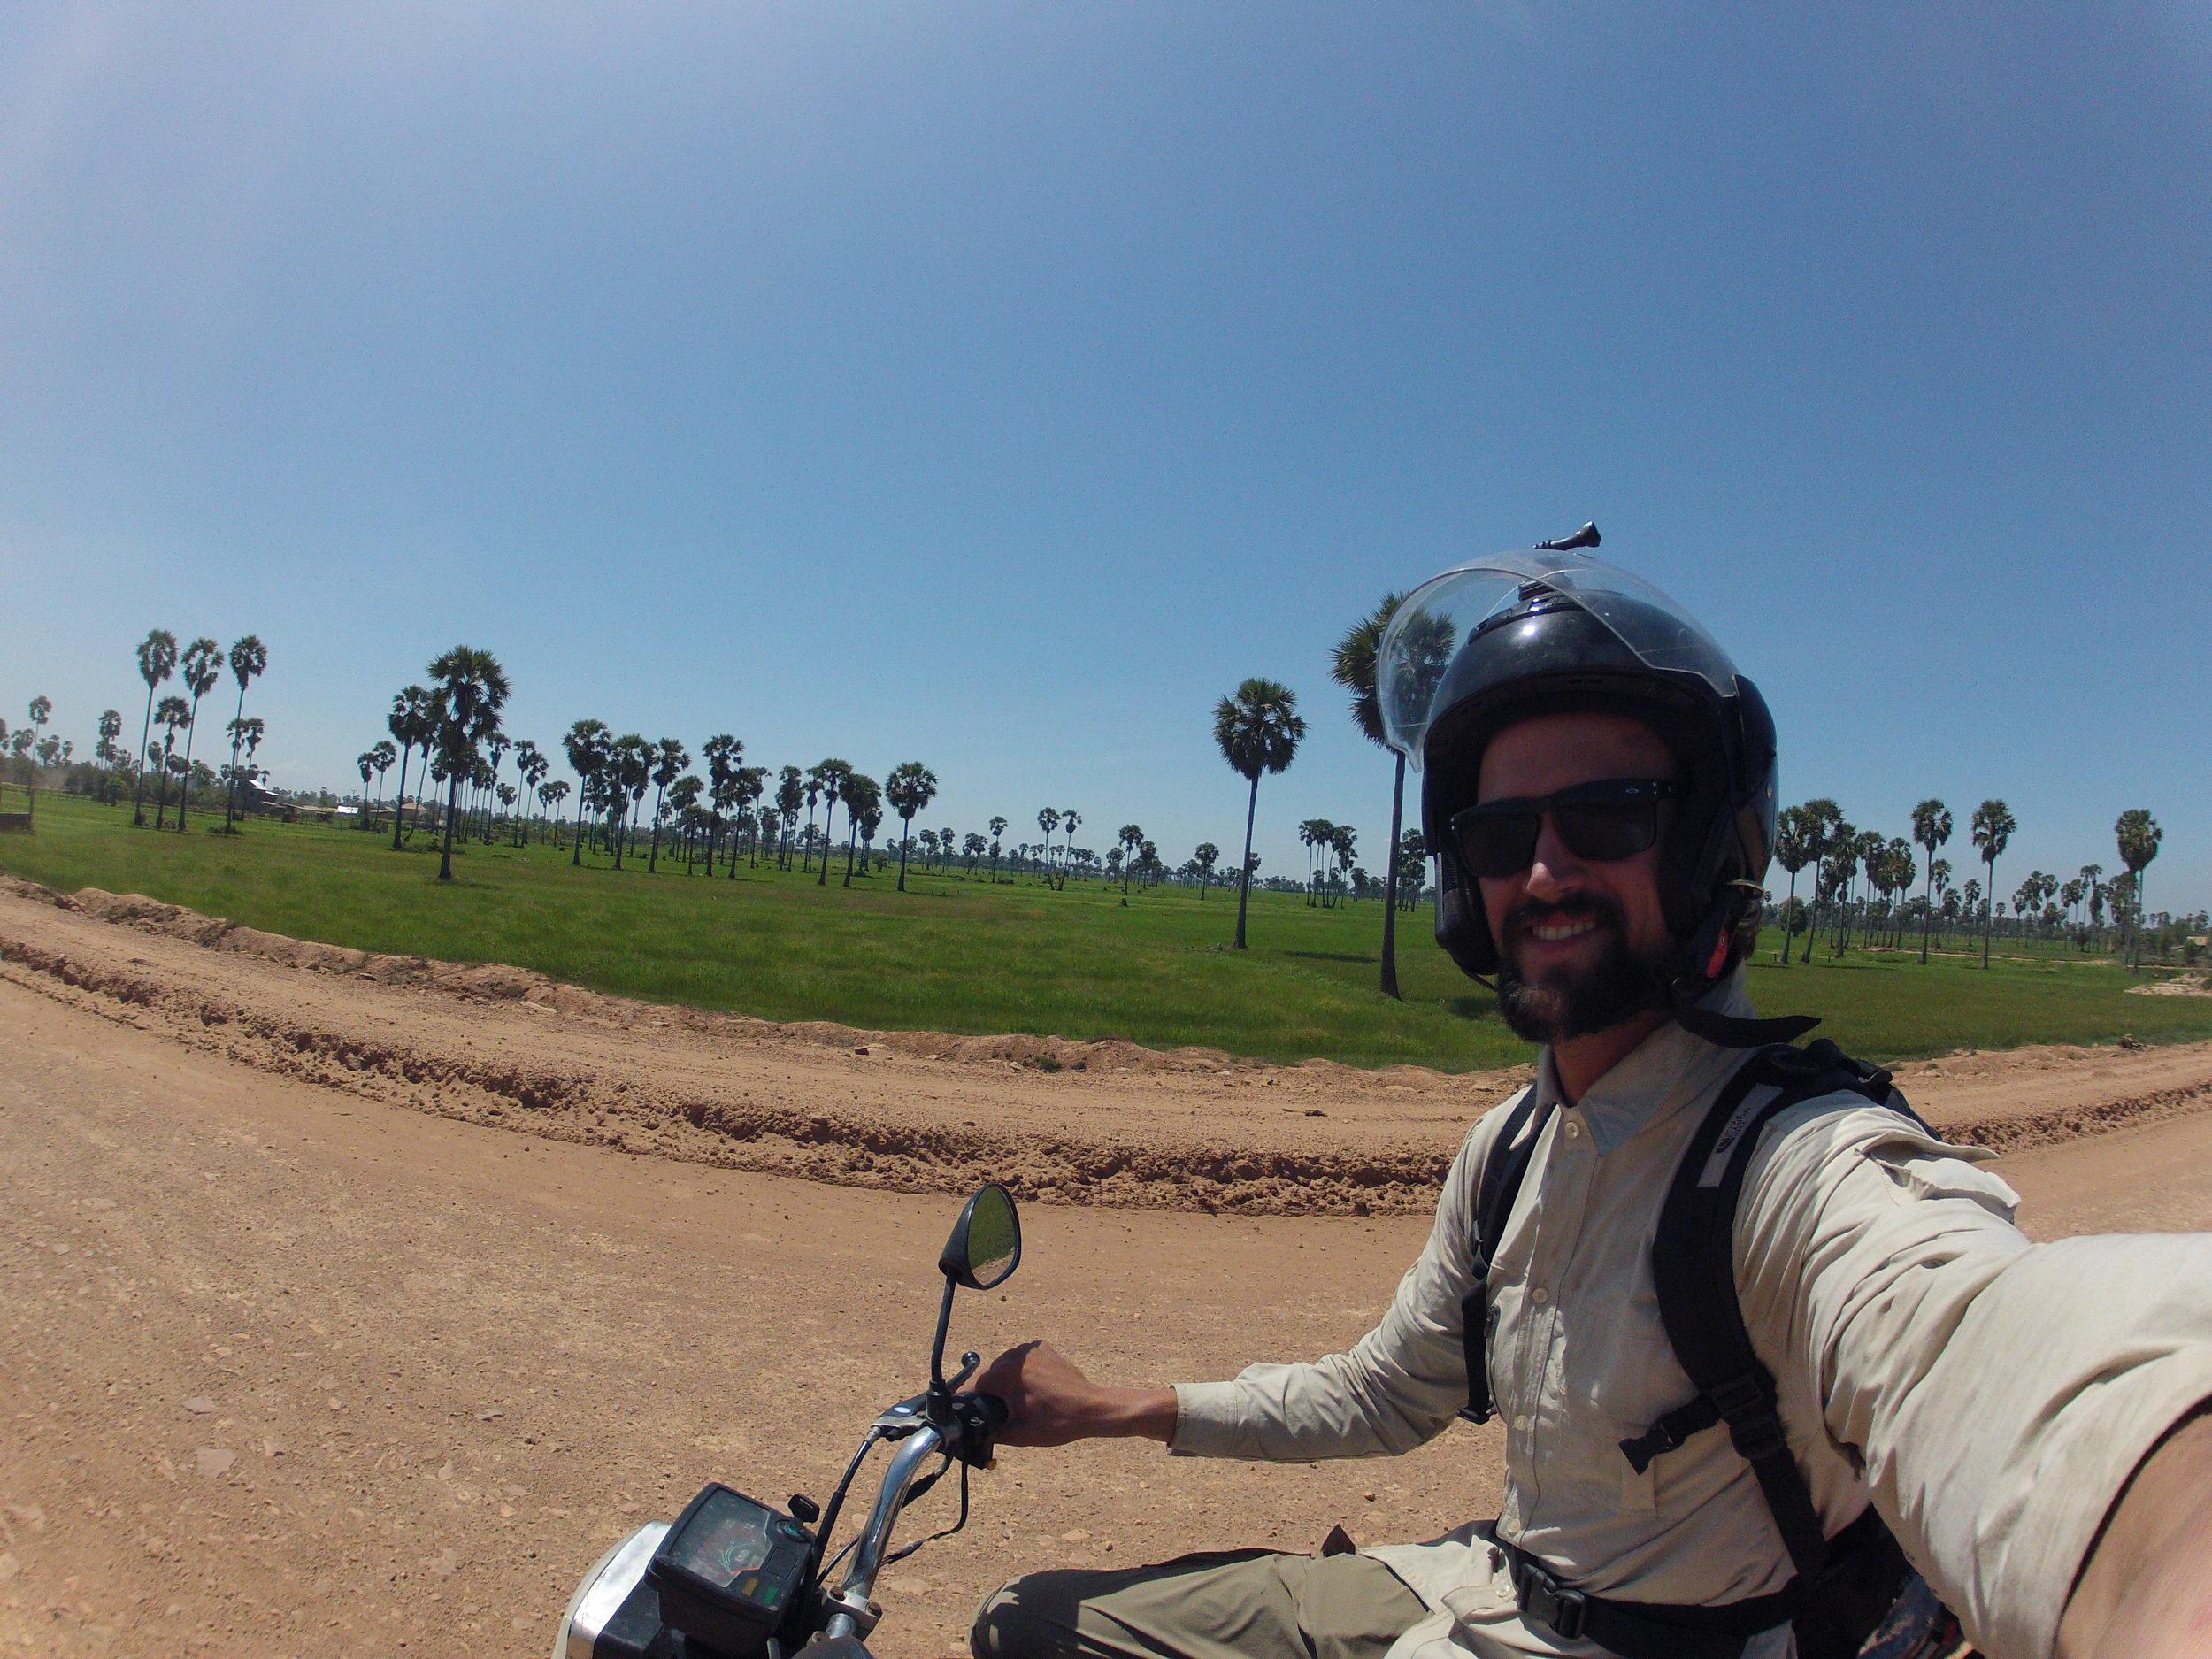 Highway 6 from Phnom Penh to Siem Reap